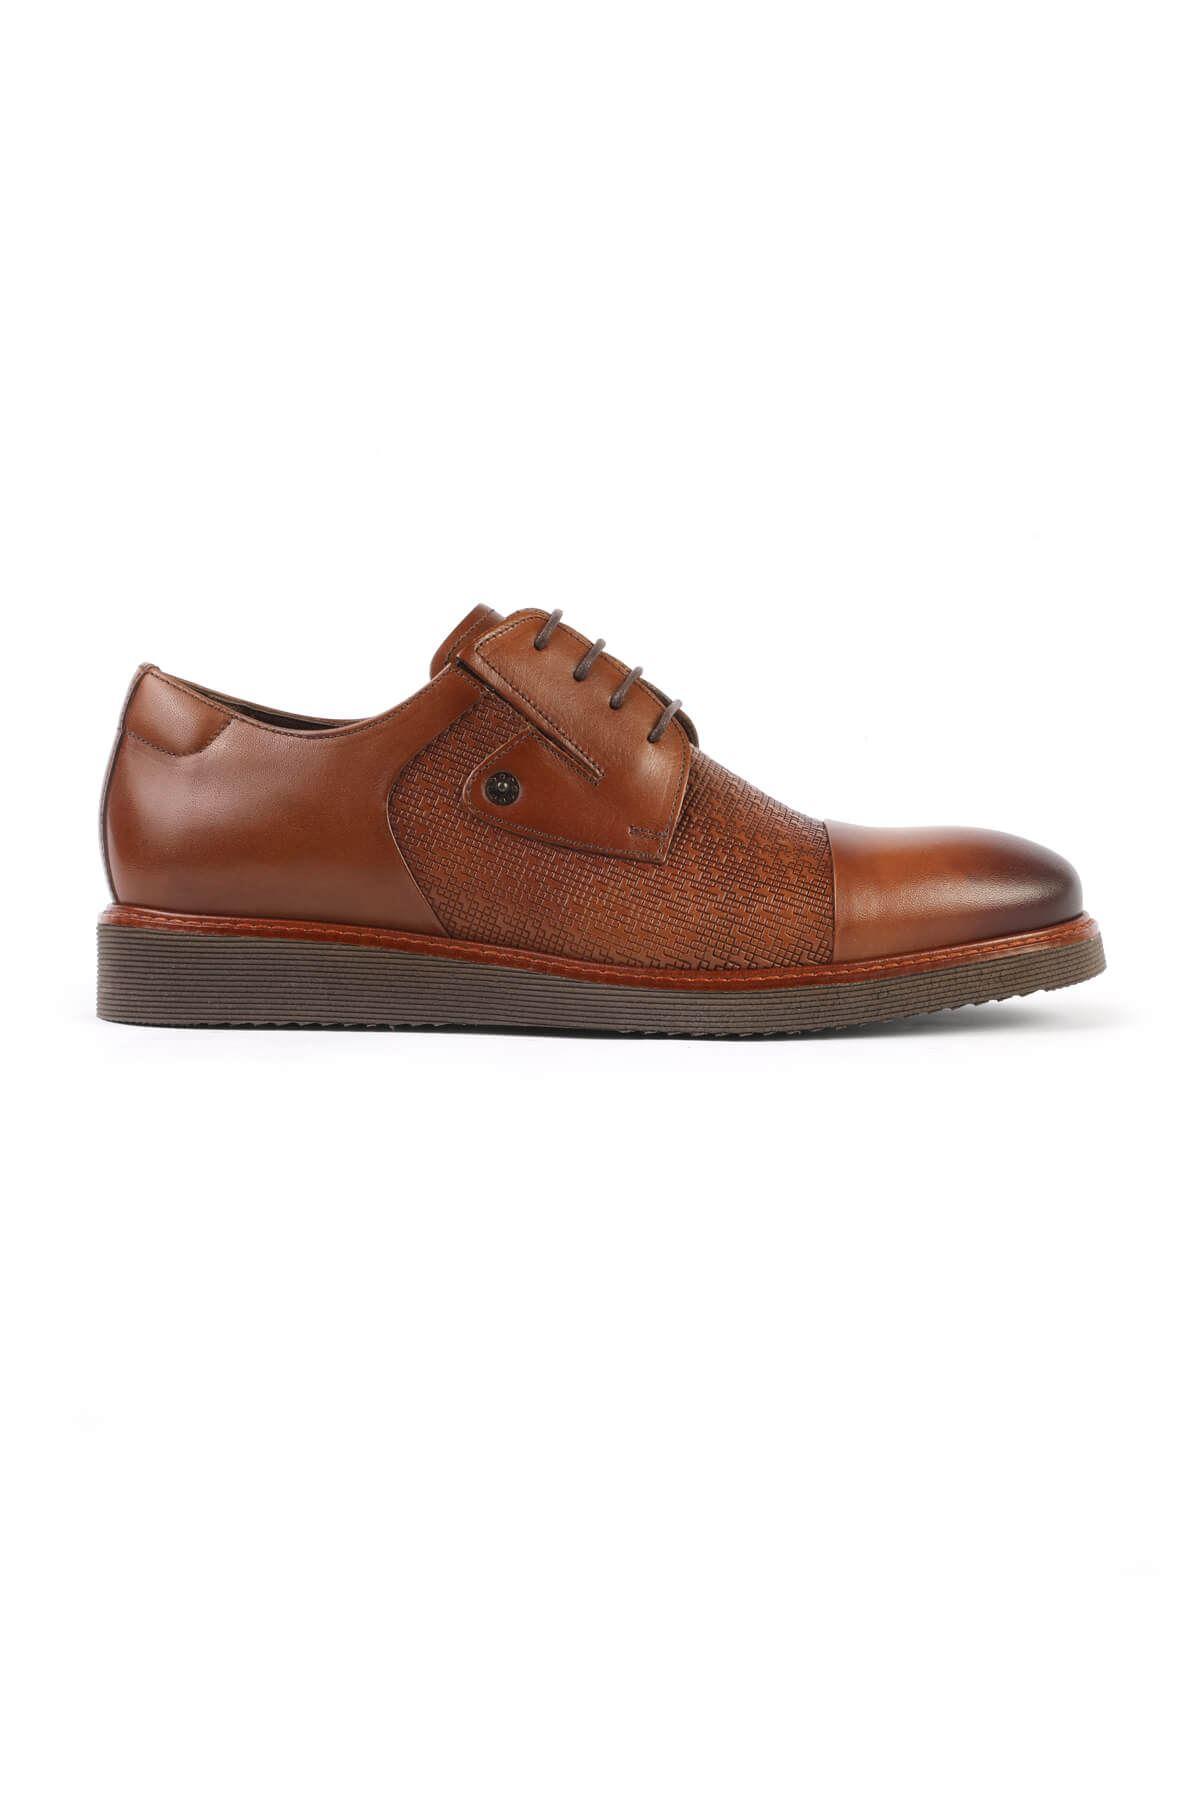 Libero C801 Tan Oxford Shoes